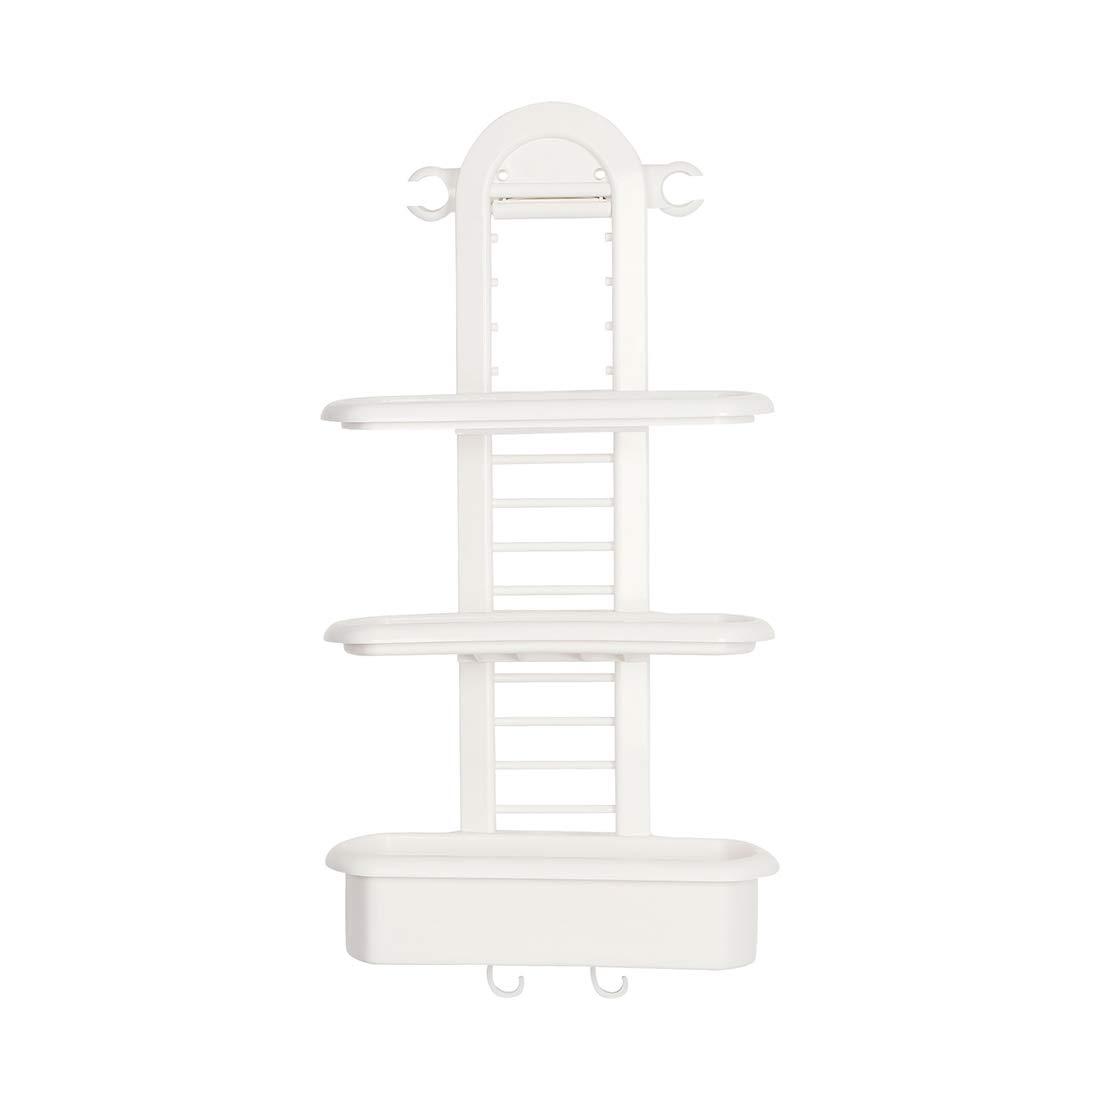 uxcell Adjustable Hanging Shower Caddies,Plastic Bathroom Storage Shelves & Tub Over The Shower Head,Basket Storage Organizer with 2 Hooks for Bathroom/Shower Stalls,White